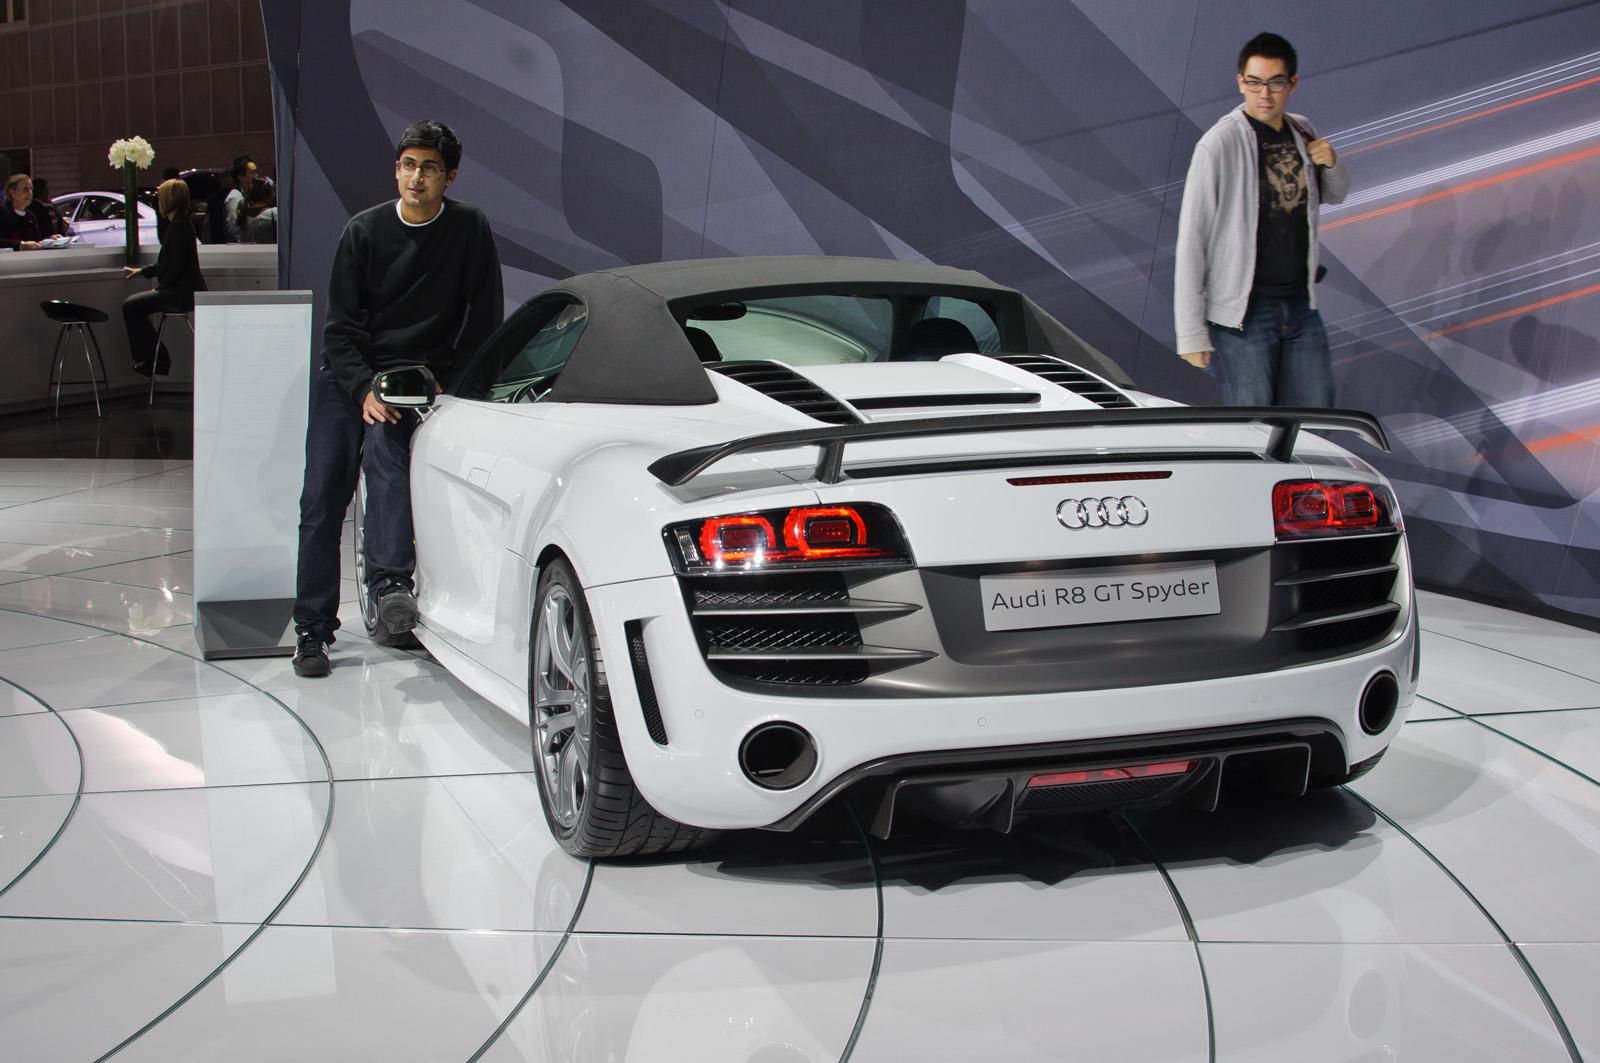 FileAudi R GT Spyder US Flickr Skinnylawyerjpg Wikimedia - Audi r8 gt